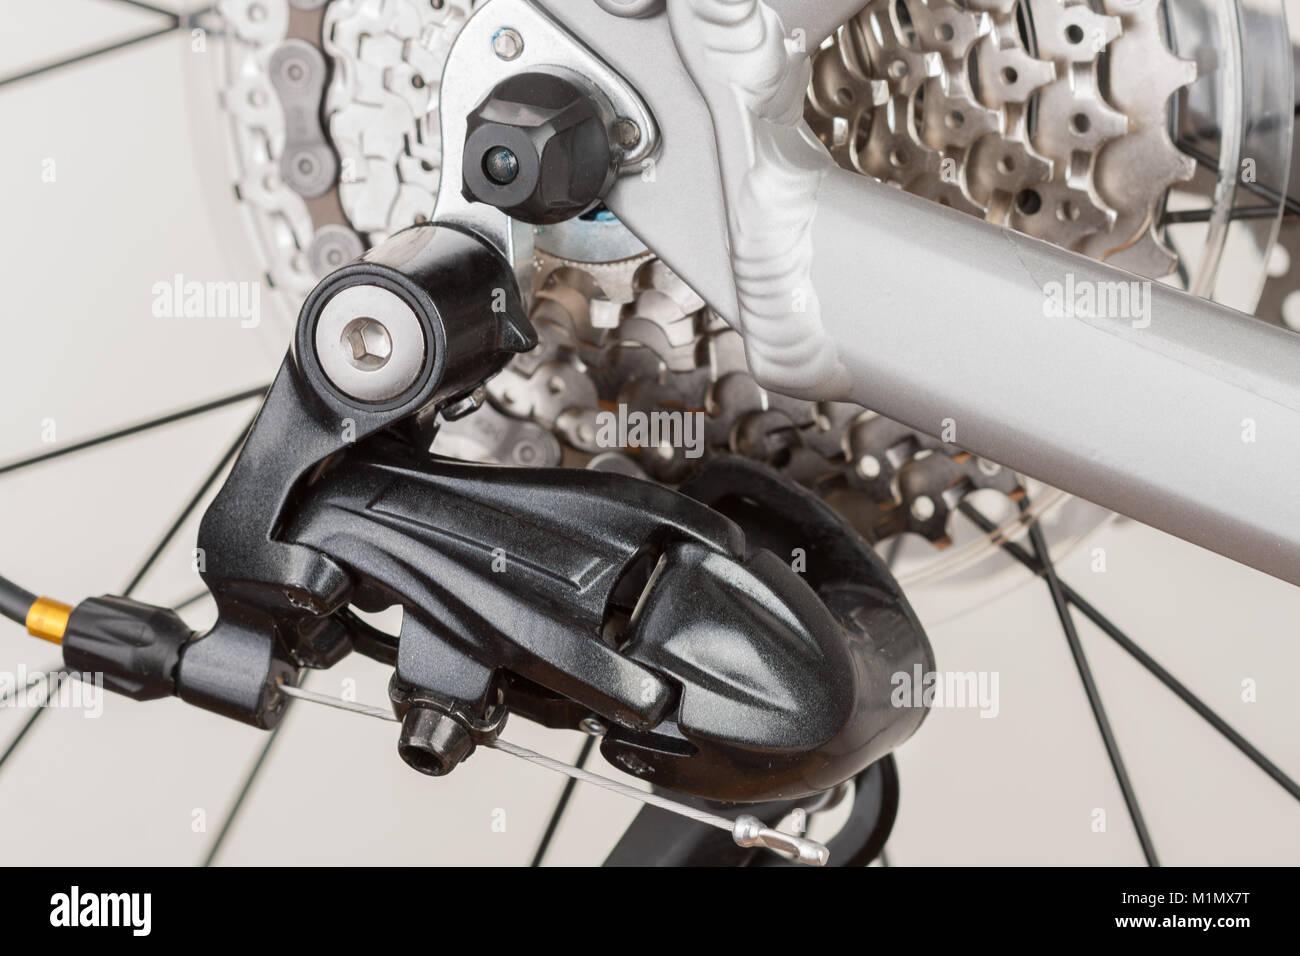 Part of bike derailleur,close up view, studio photo. Stock Photo